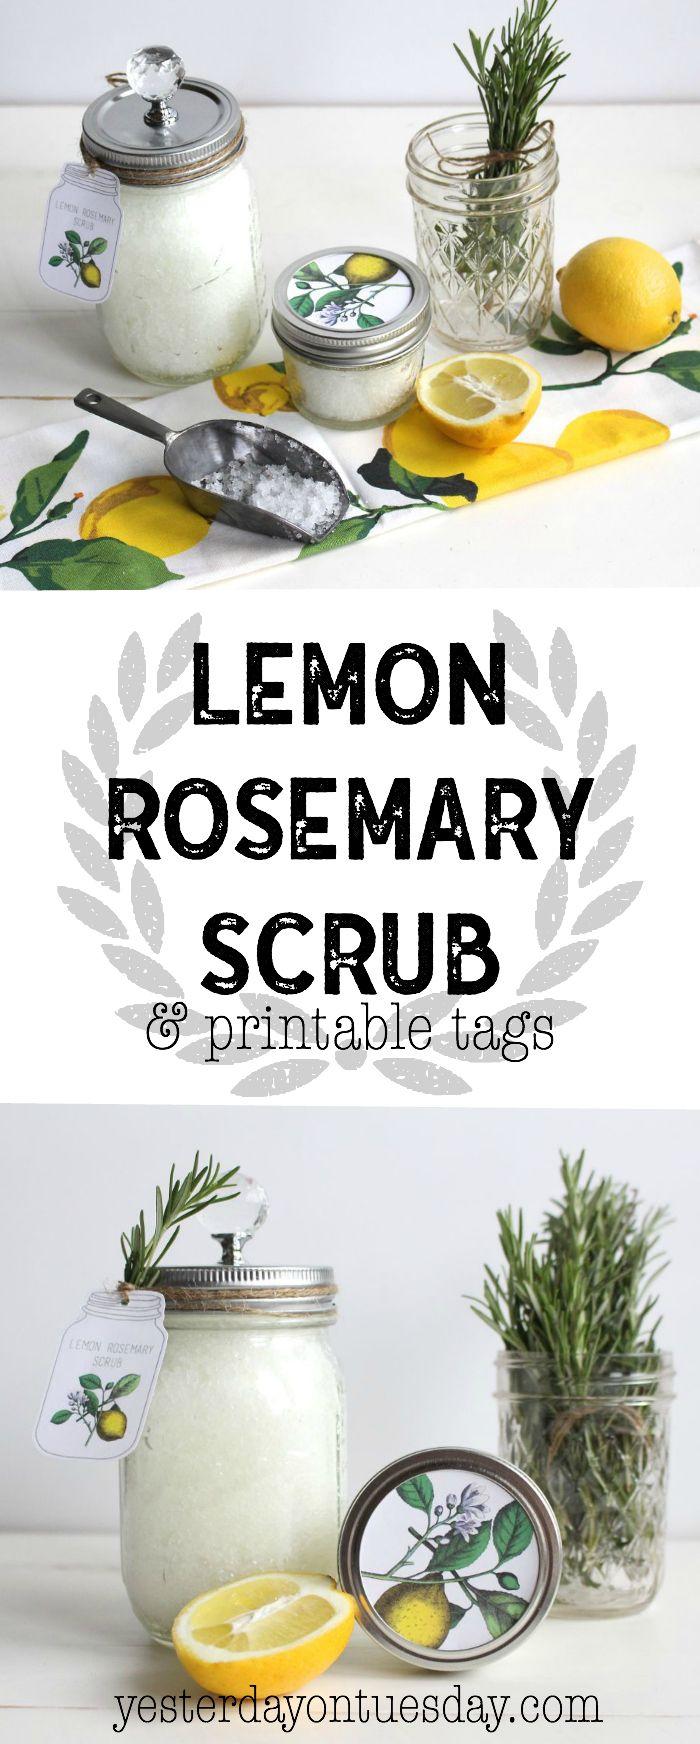 Lemon Rosemary Scrub and Printable Tags